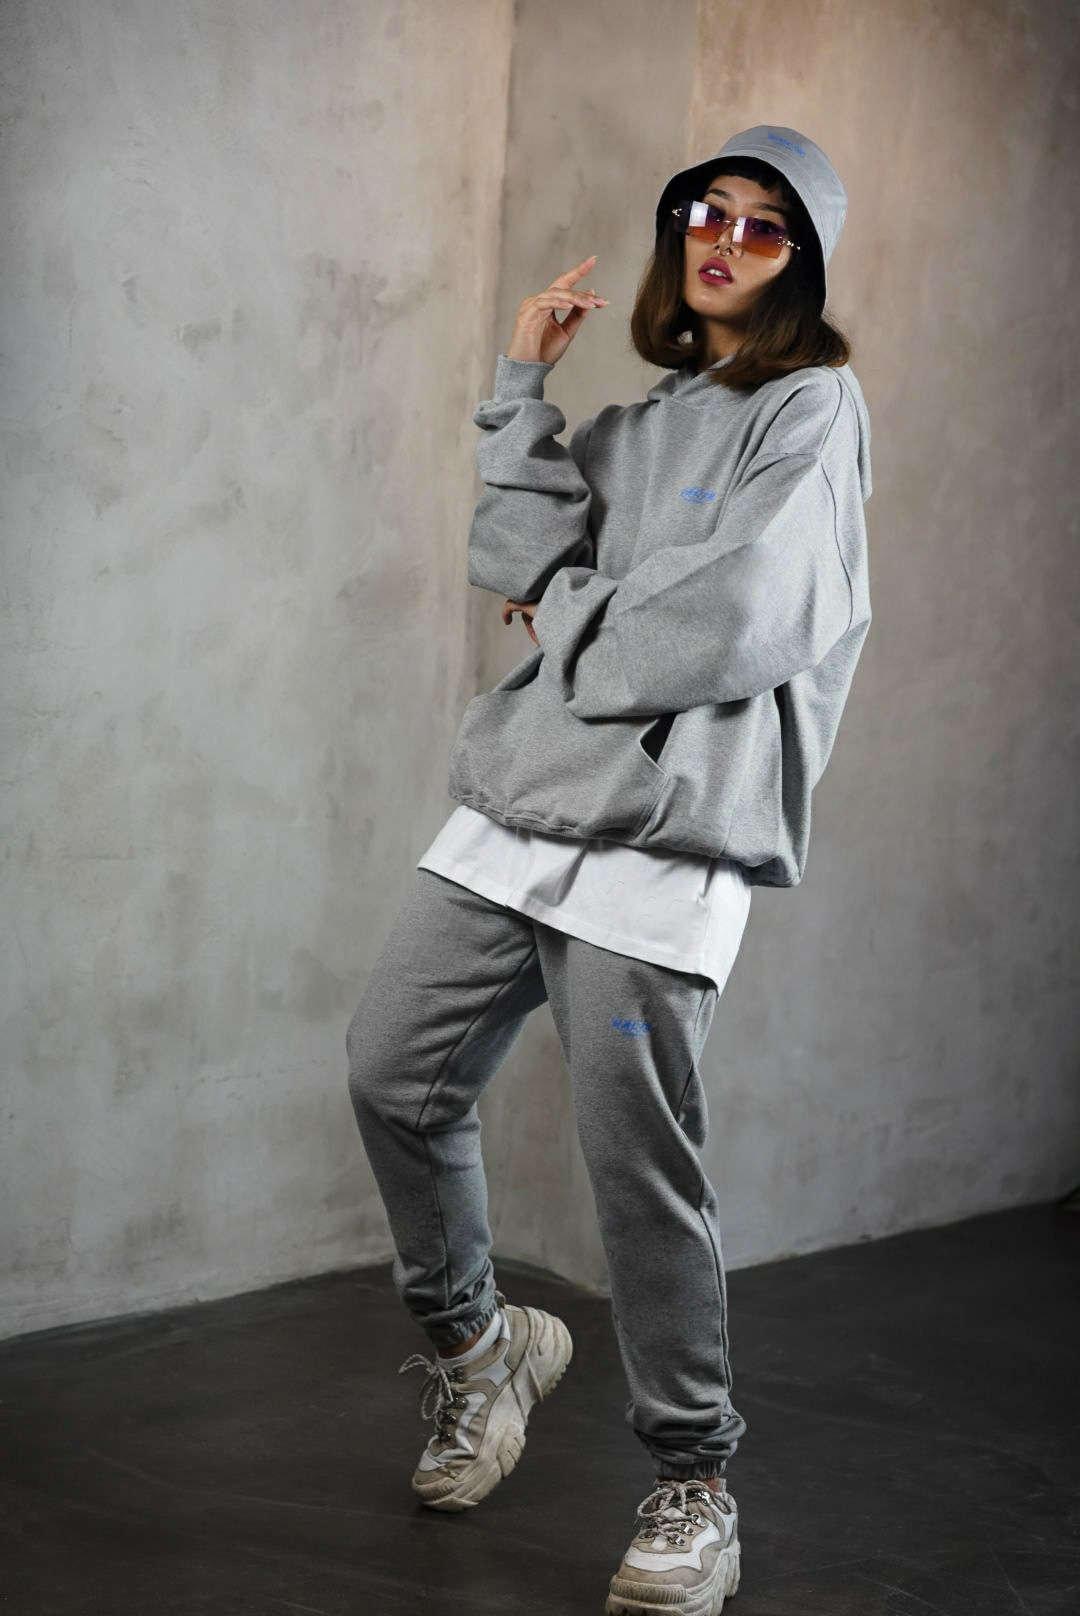 Halin Worldwide Not Today Streetwear Collection Lookbook - Model wearing cozy Halin jogging suit.